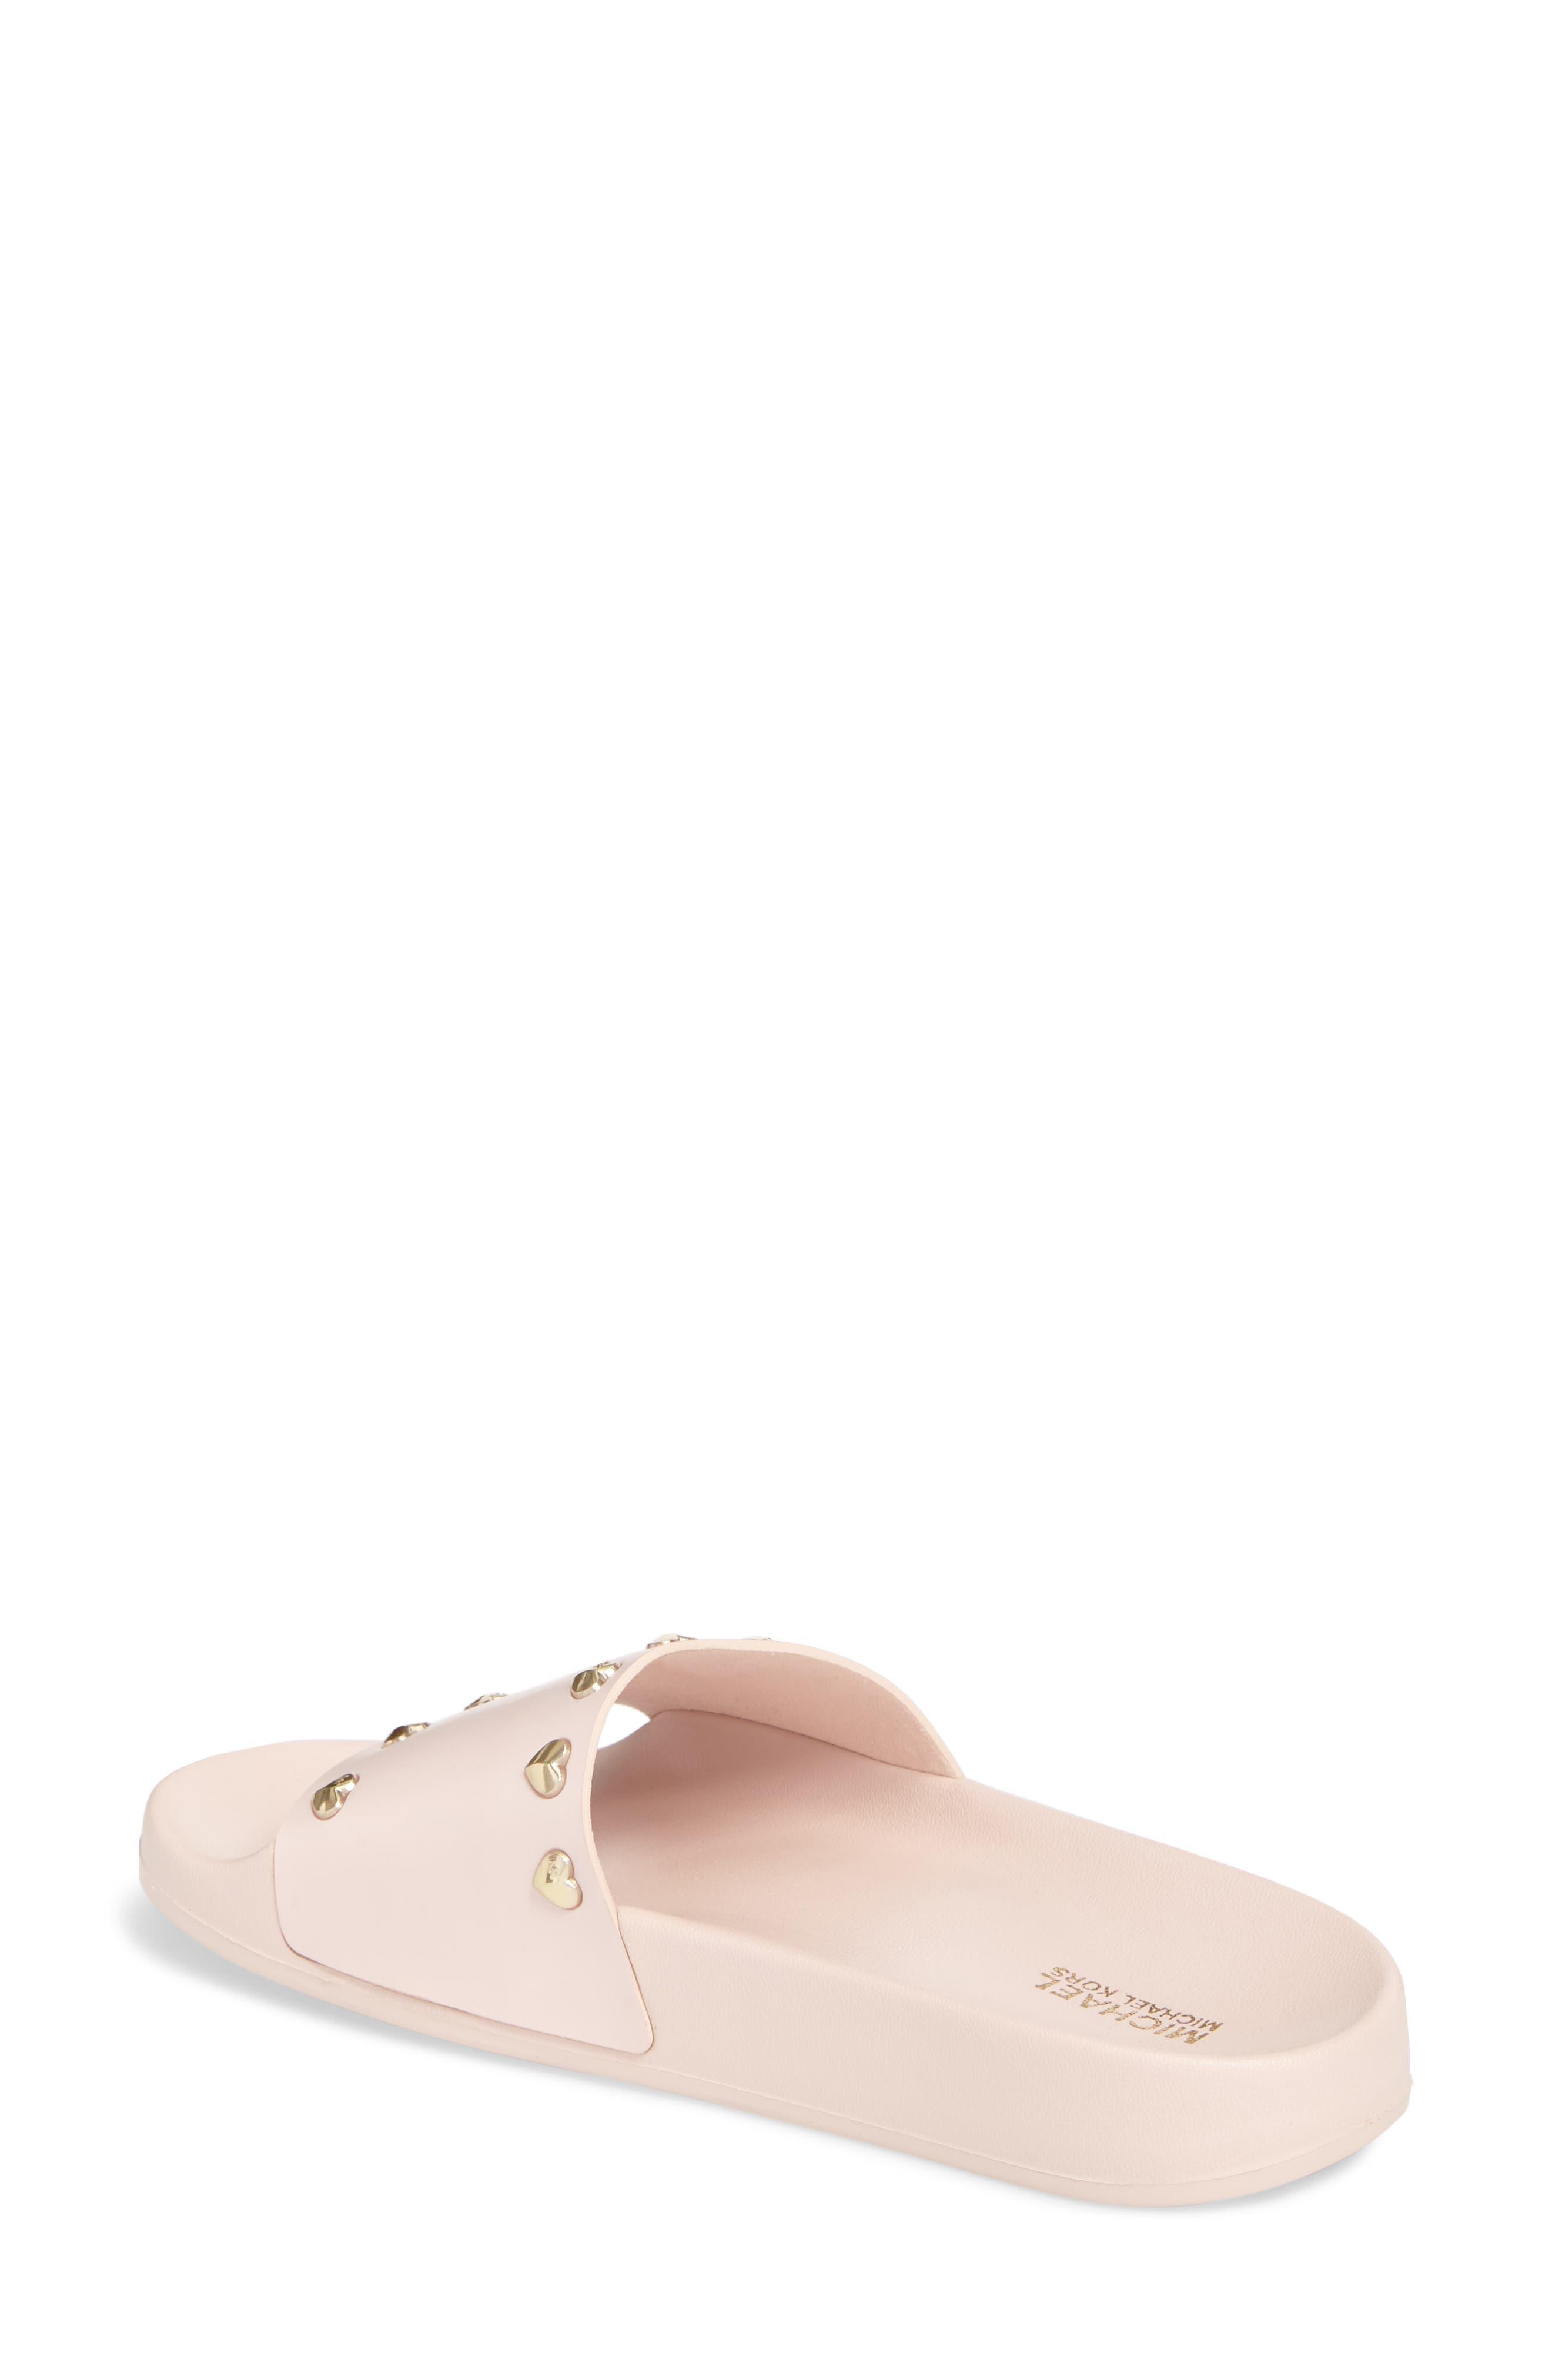 Zooey Slide Sandal,                             Alternate thumbnail 2, color,                             Soft Pink